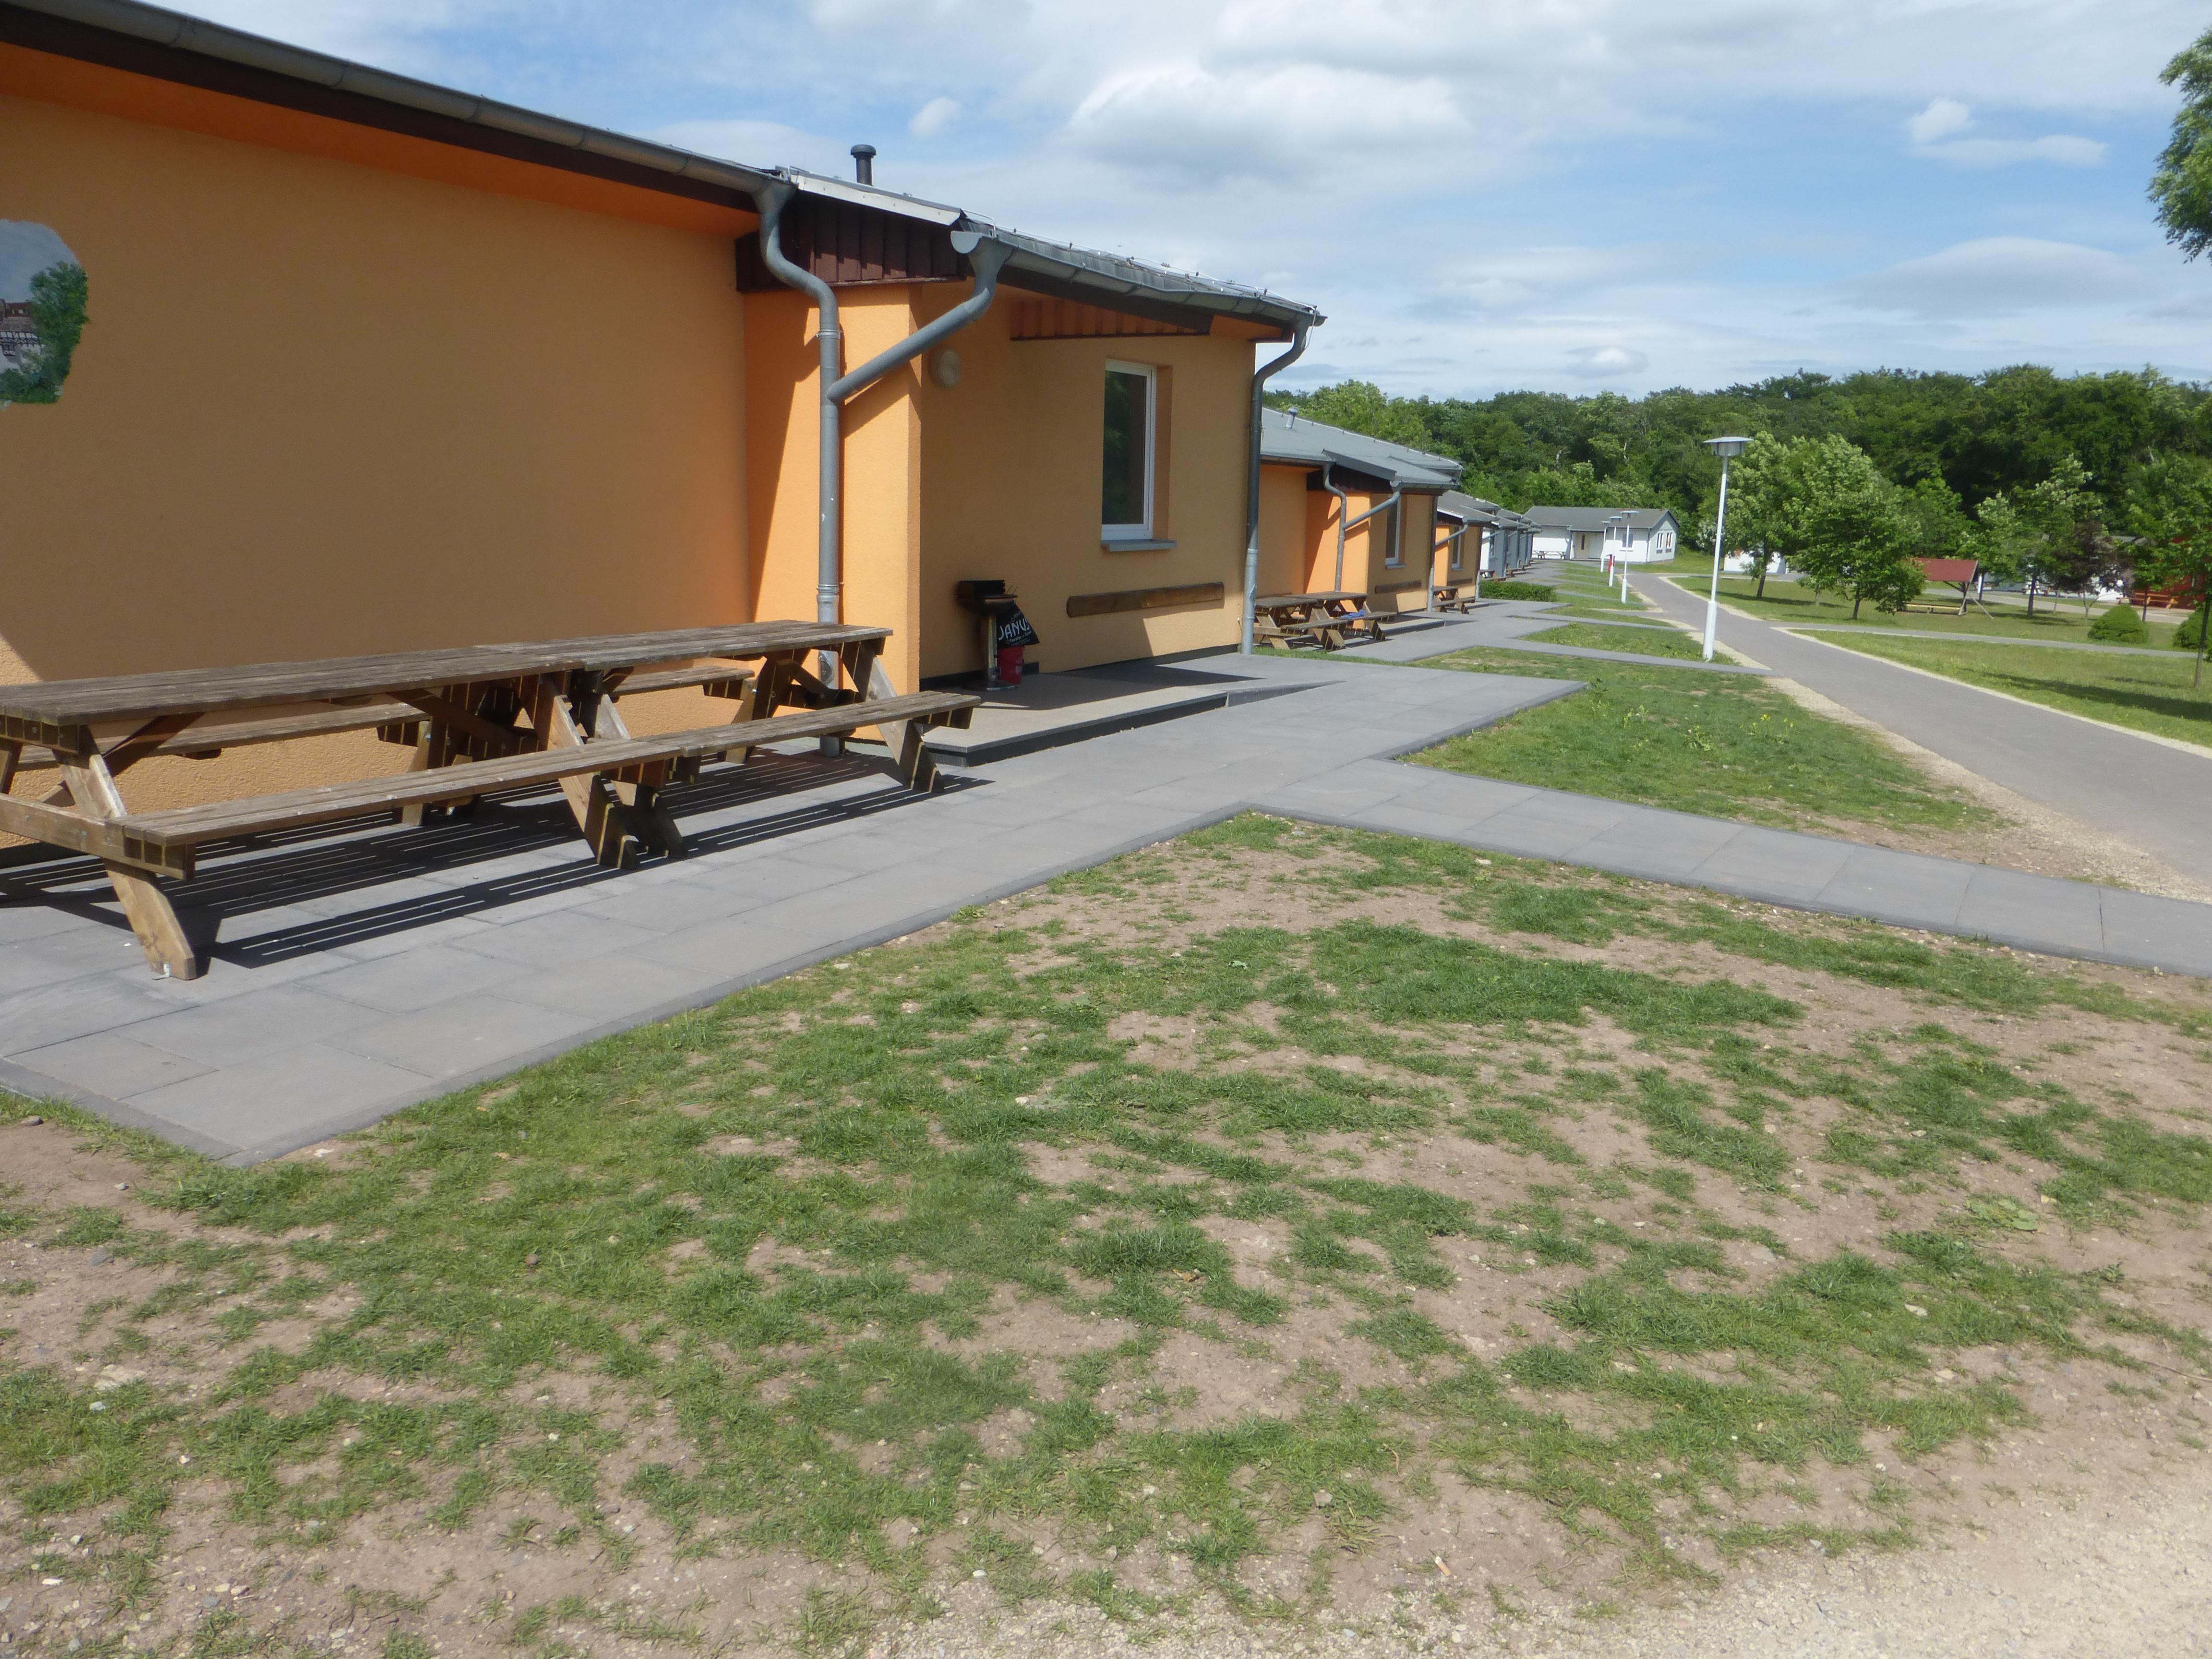 WegenetzFerienparkFeuerkkuppe.JPG